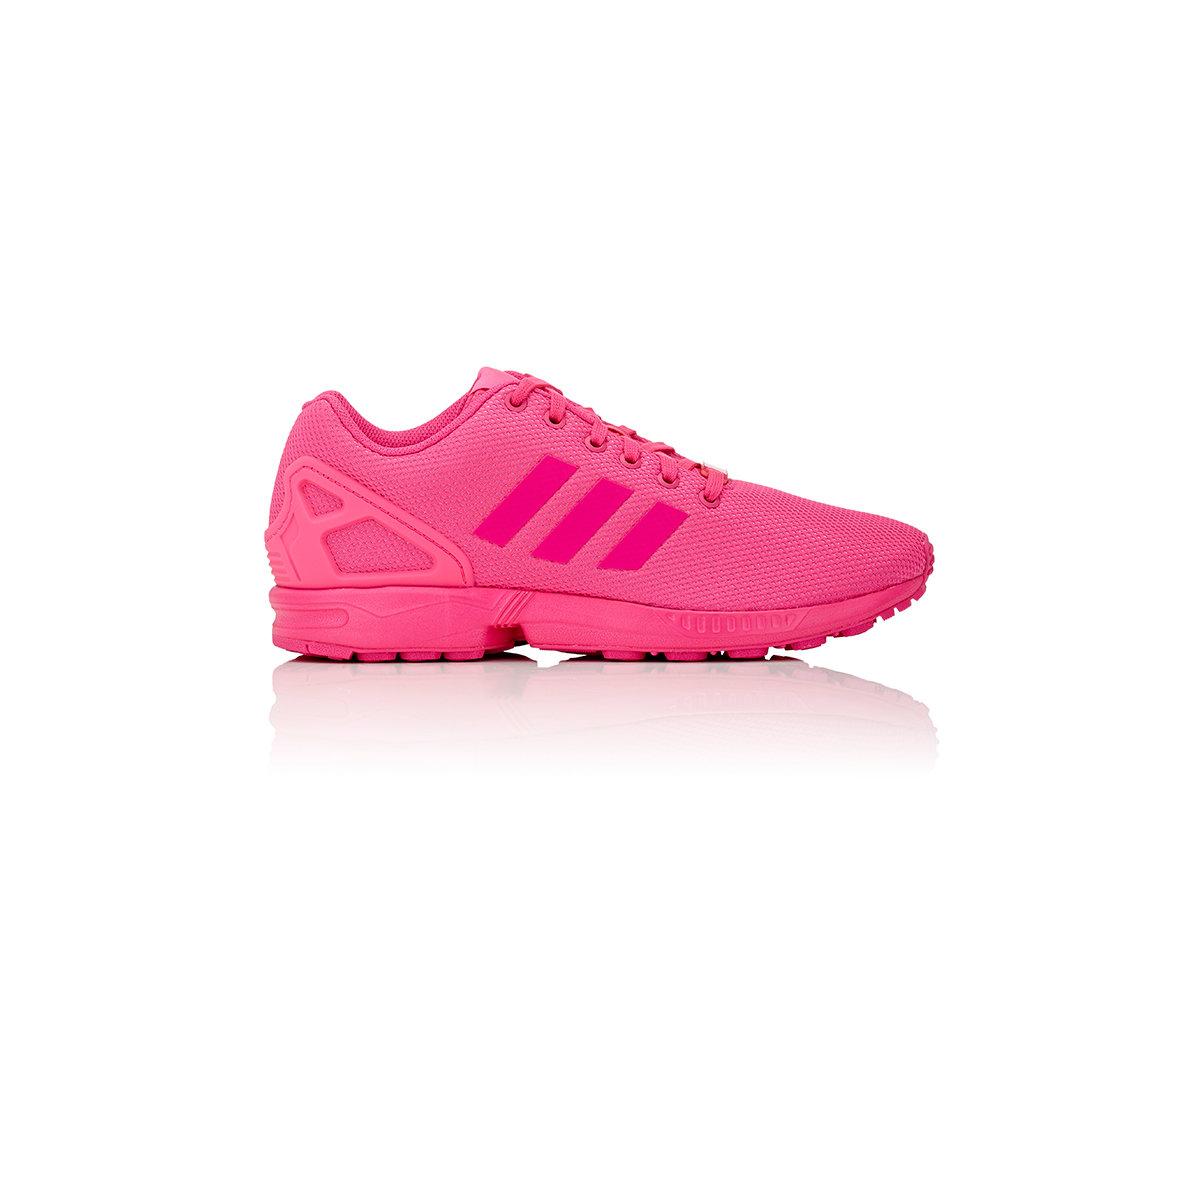 adidas originals men 39 s zx flux sneakers in pink for men lyst. Black Bedroom Furniture Sets. Home Design Ideas